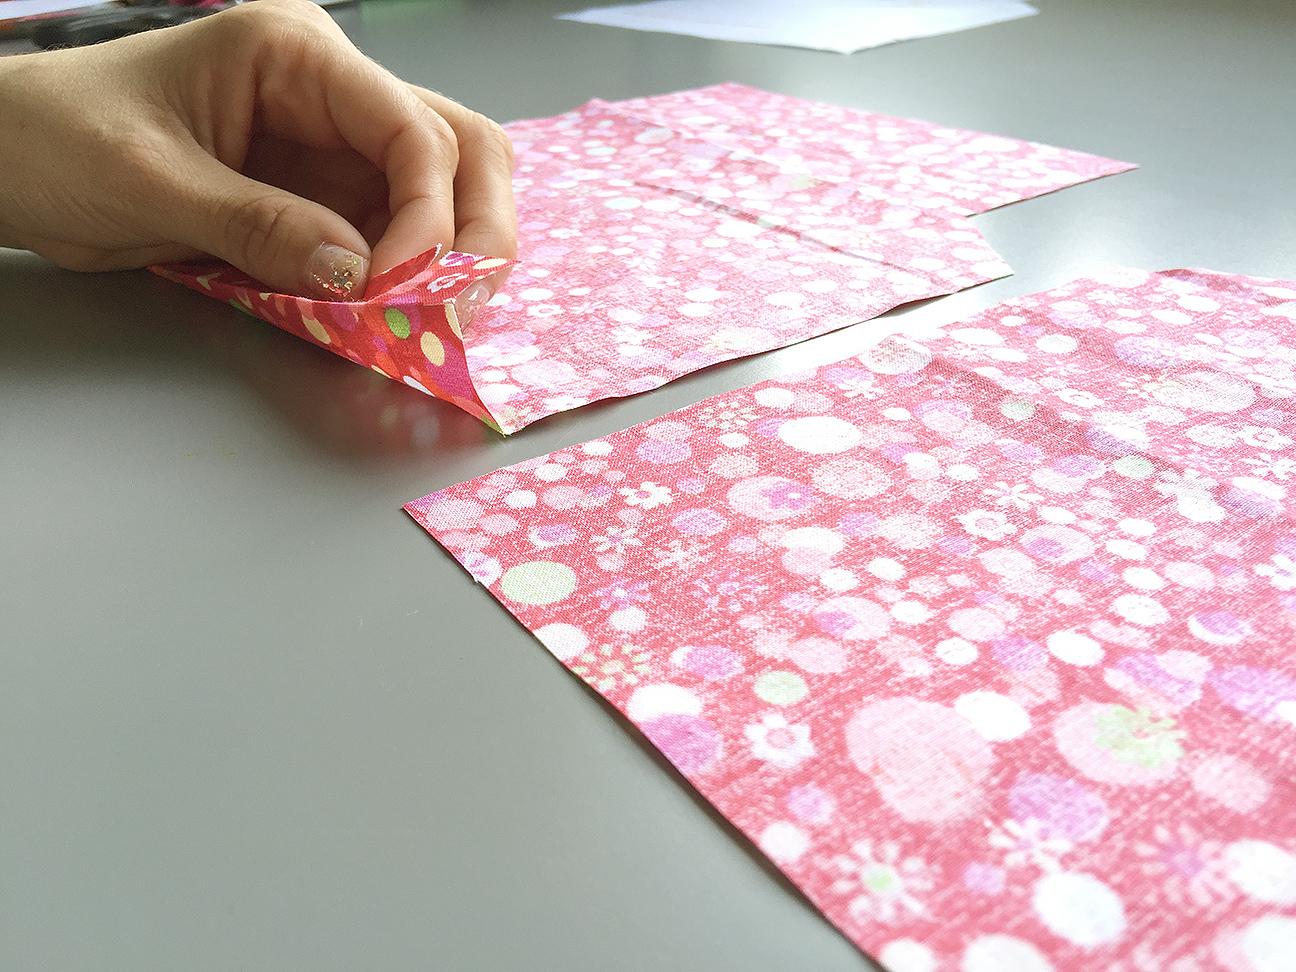 How to Sew a Kickpleat, Press hem lines | @vintageontap